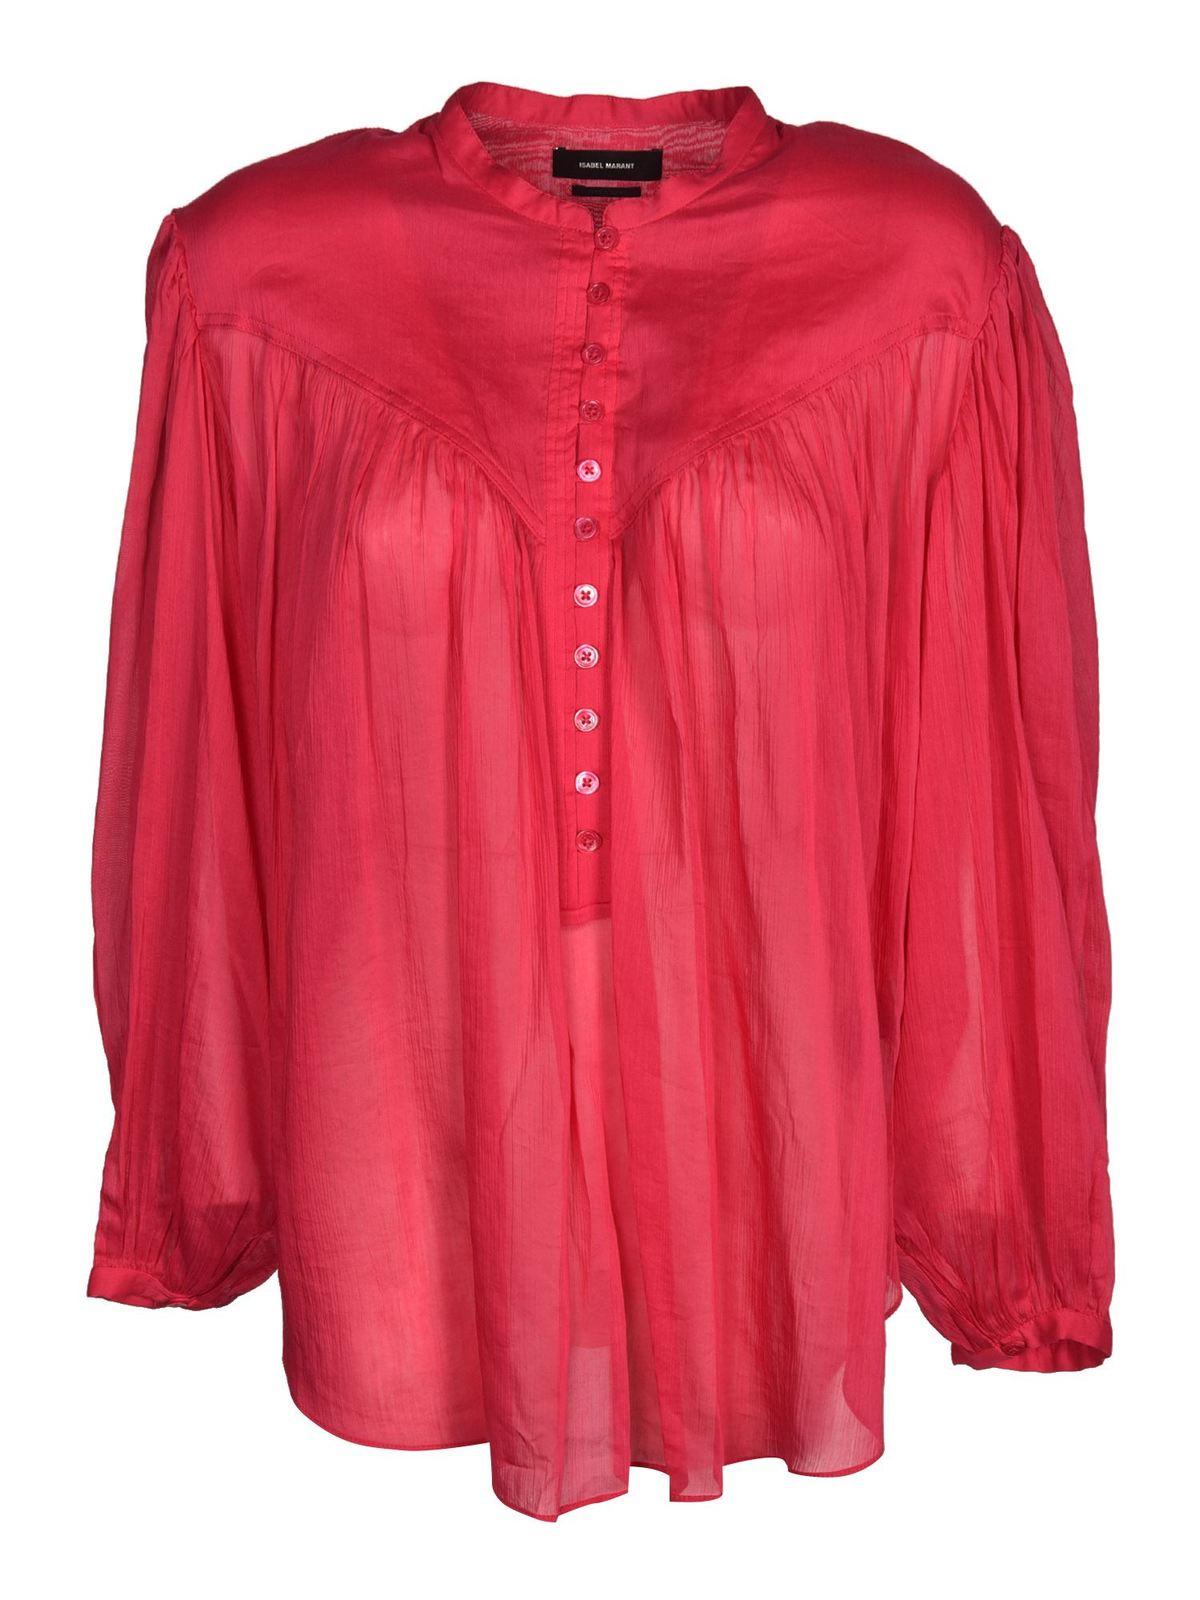 Isabel Marant Cottons KILEDIA BLOUSE IN FUCHSIA